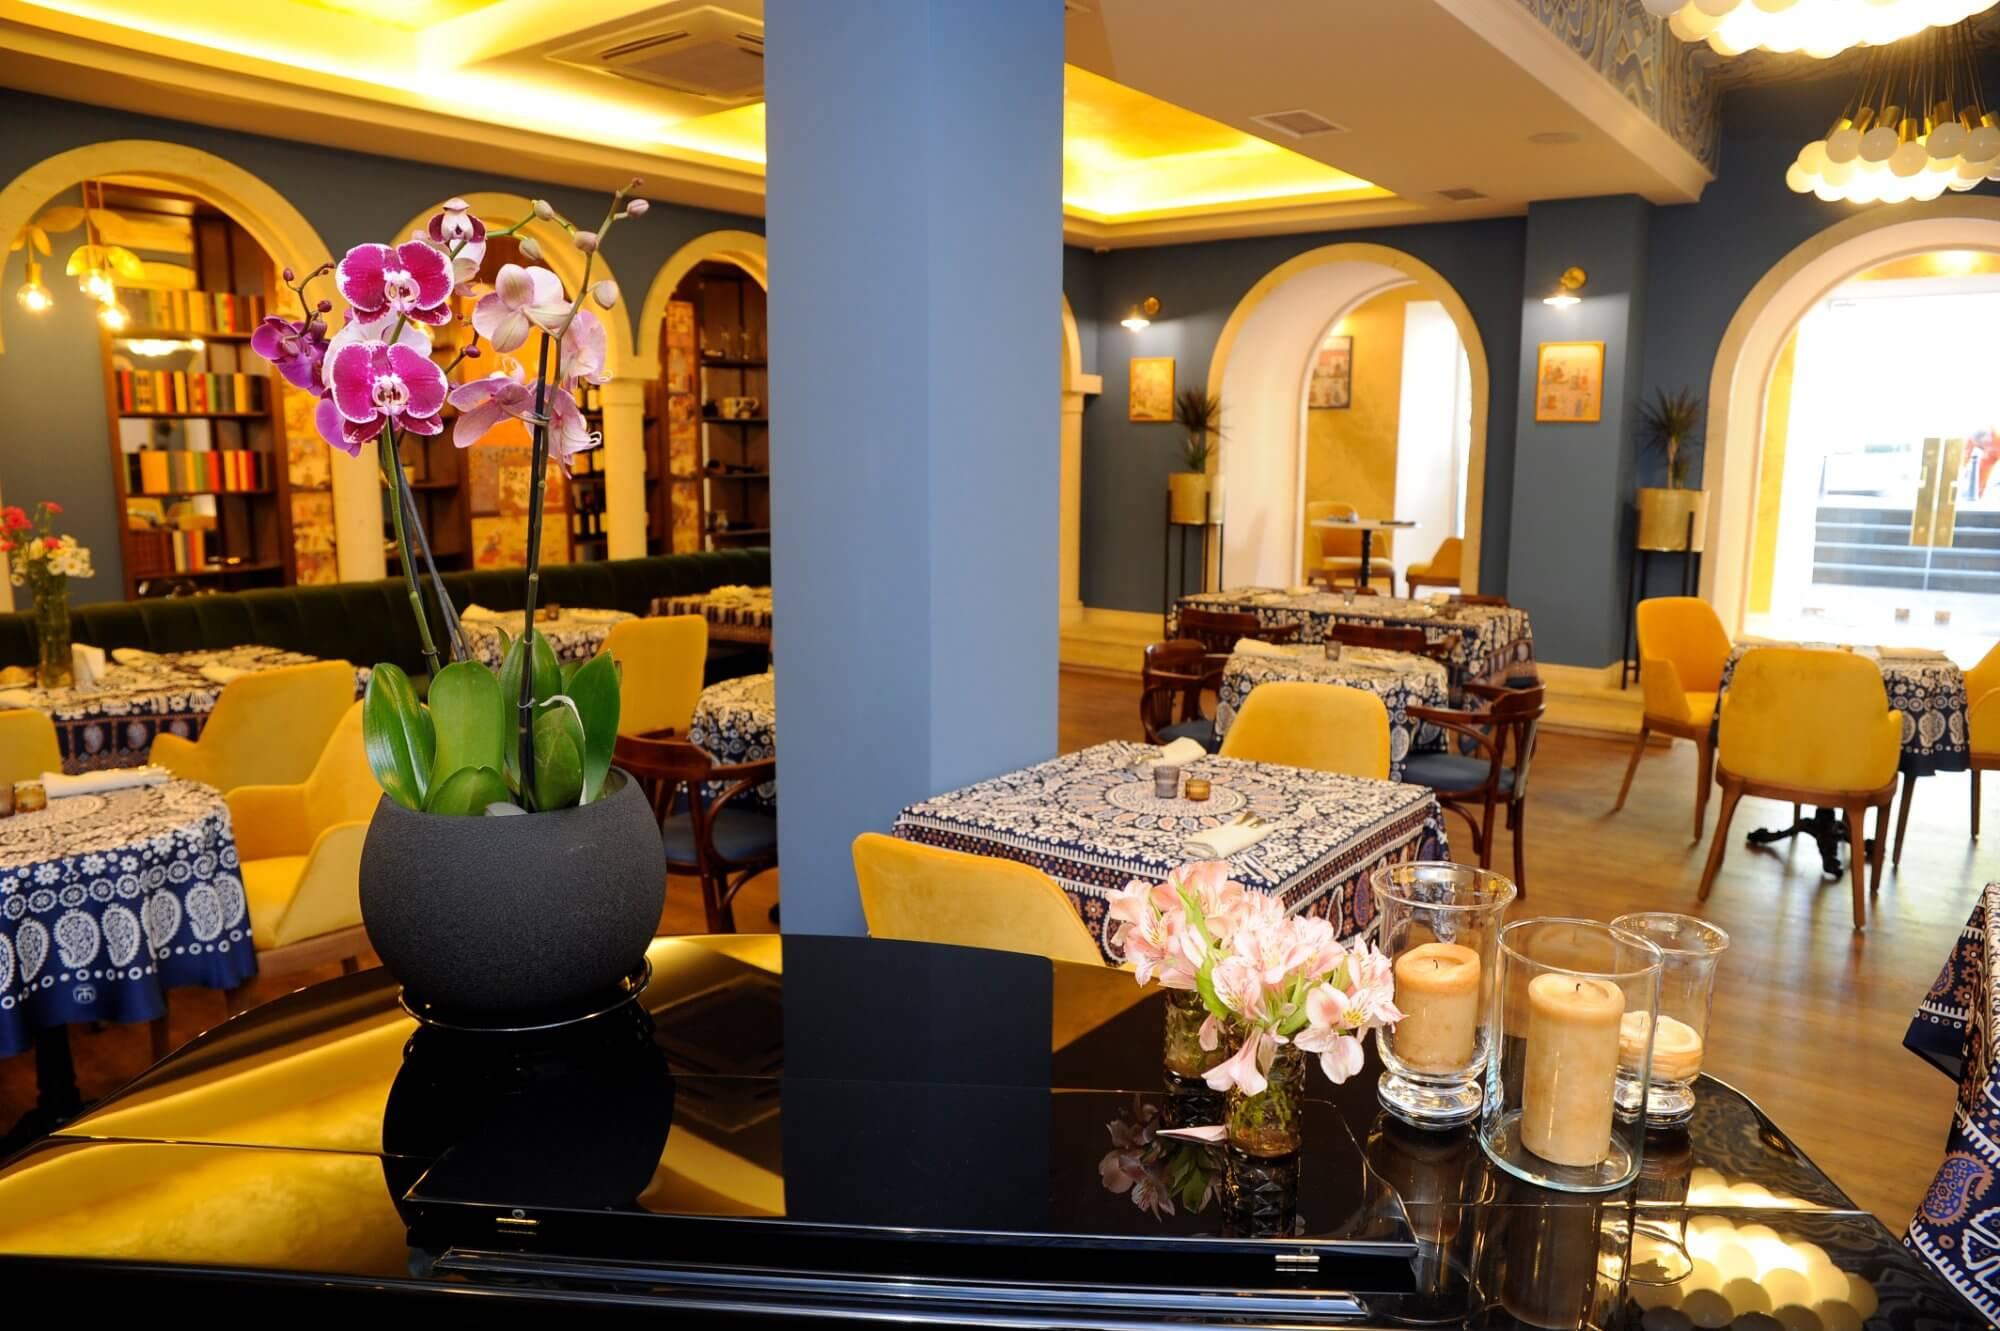 Cafe Rustaveli, Тбилиси, Грузия, кафе и рестораны Тбилиси